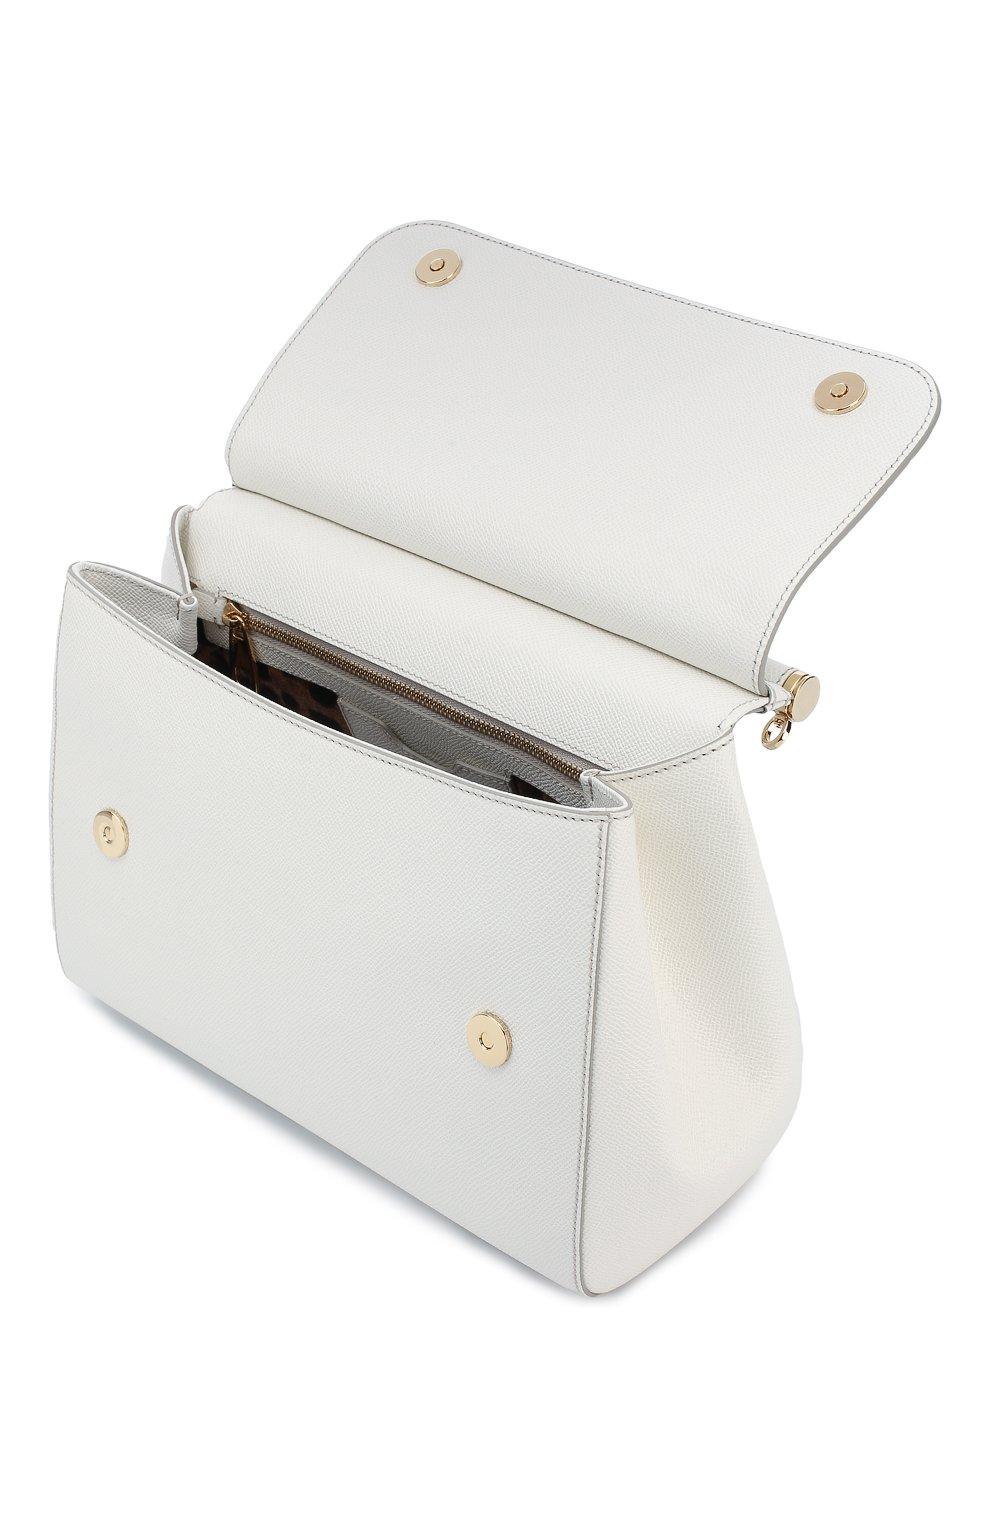 Сумка Sicily medium new Dolce & Gabbana белая цвета | Фото №4